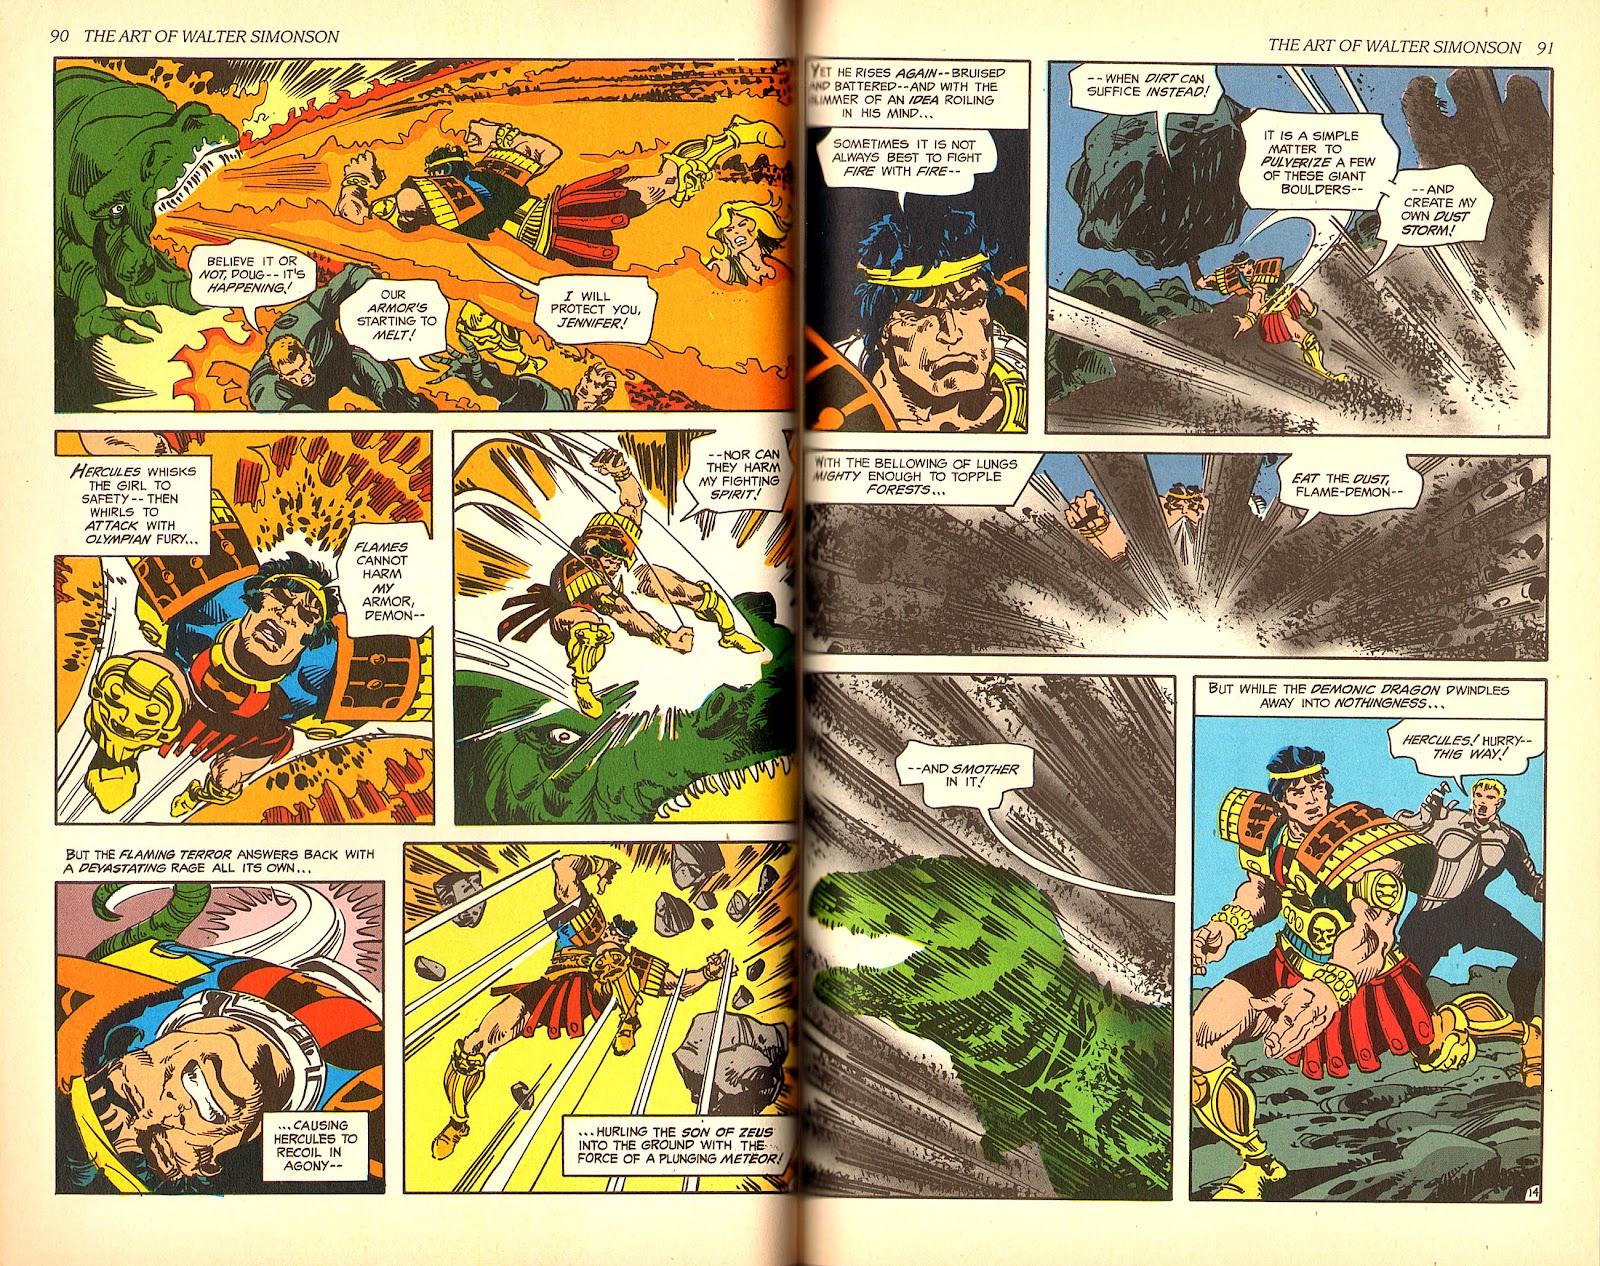 Read online The Art of Walter Simonson comic -  Issue # TPB - 47